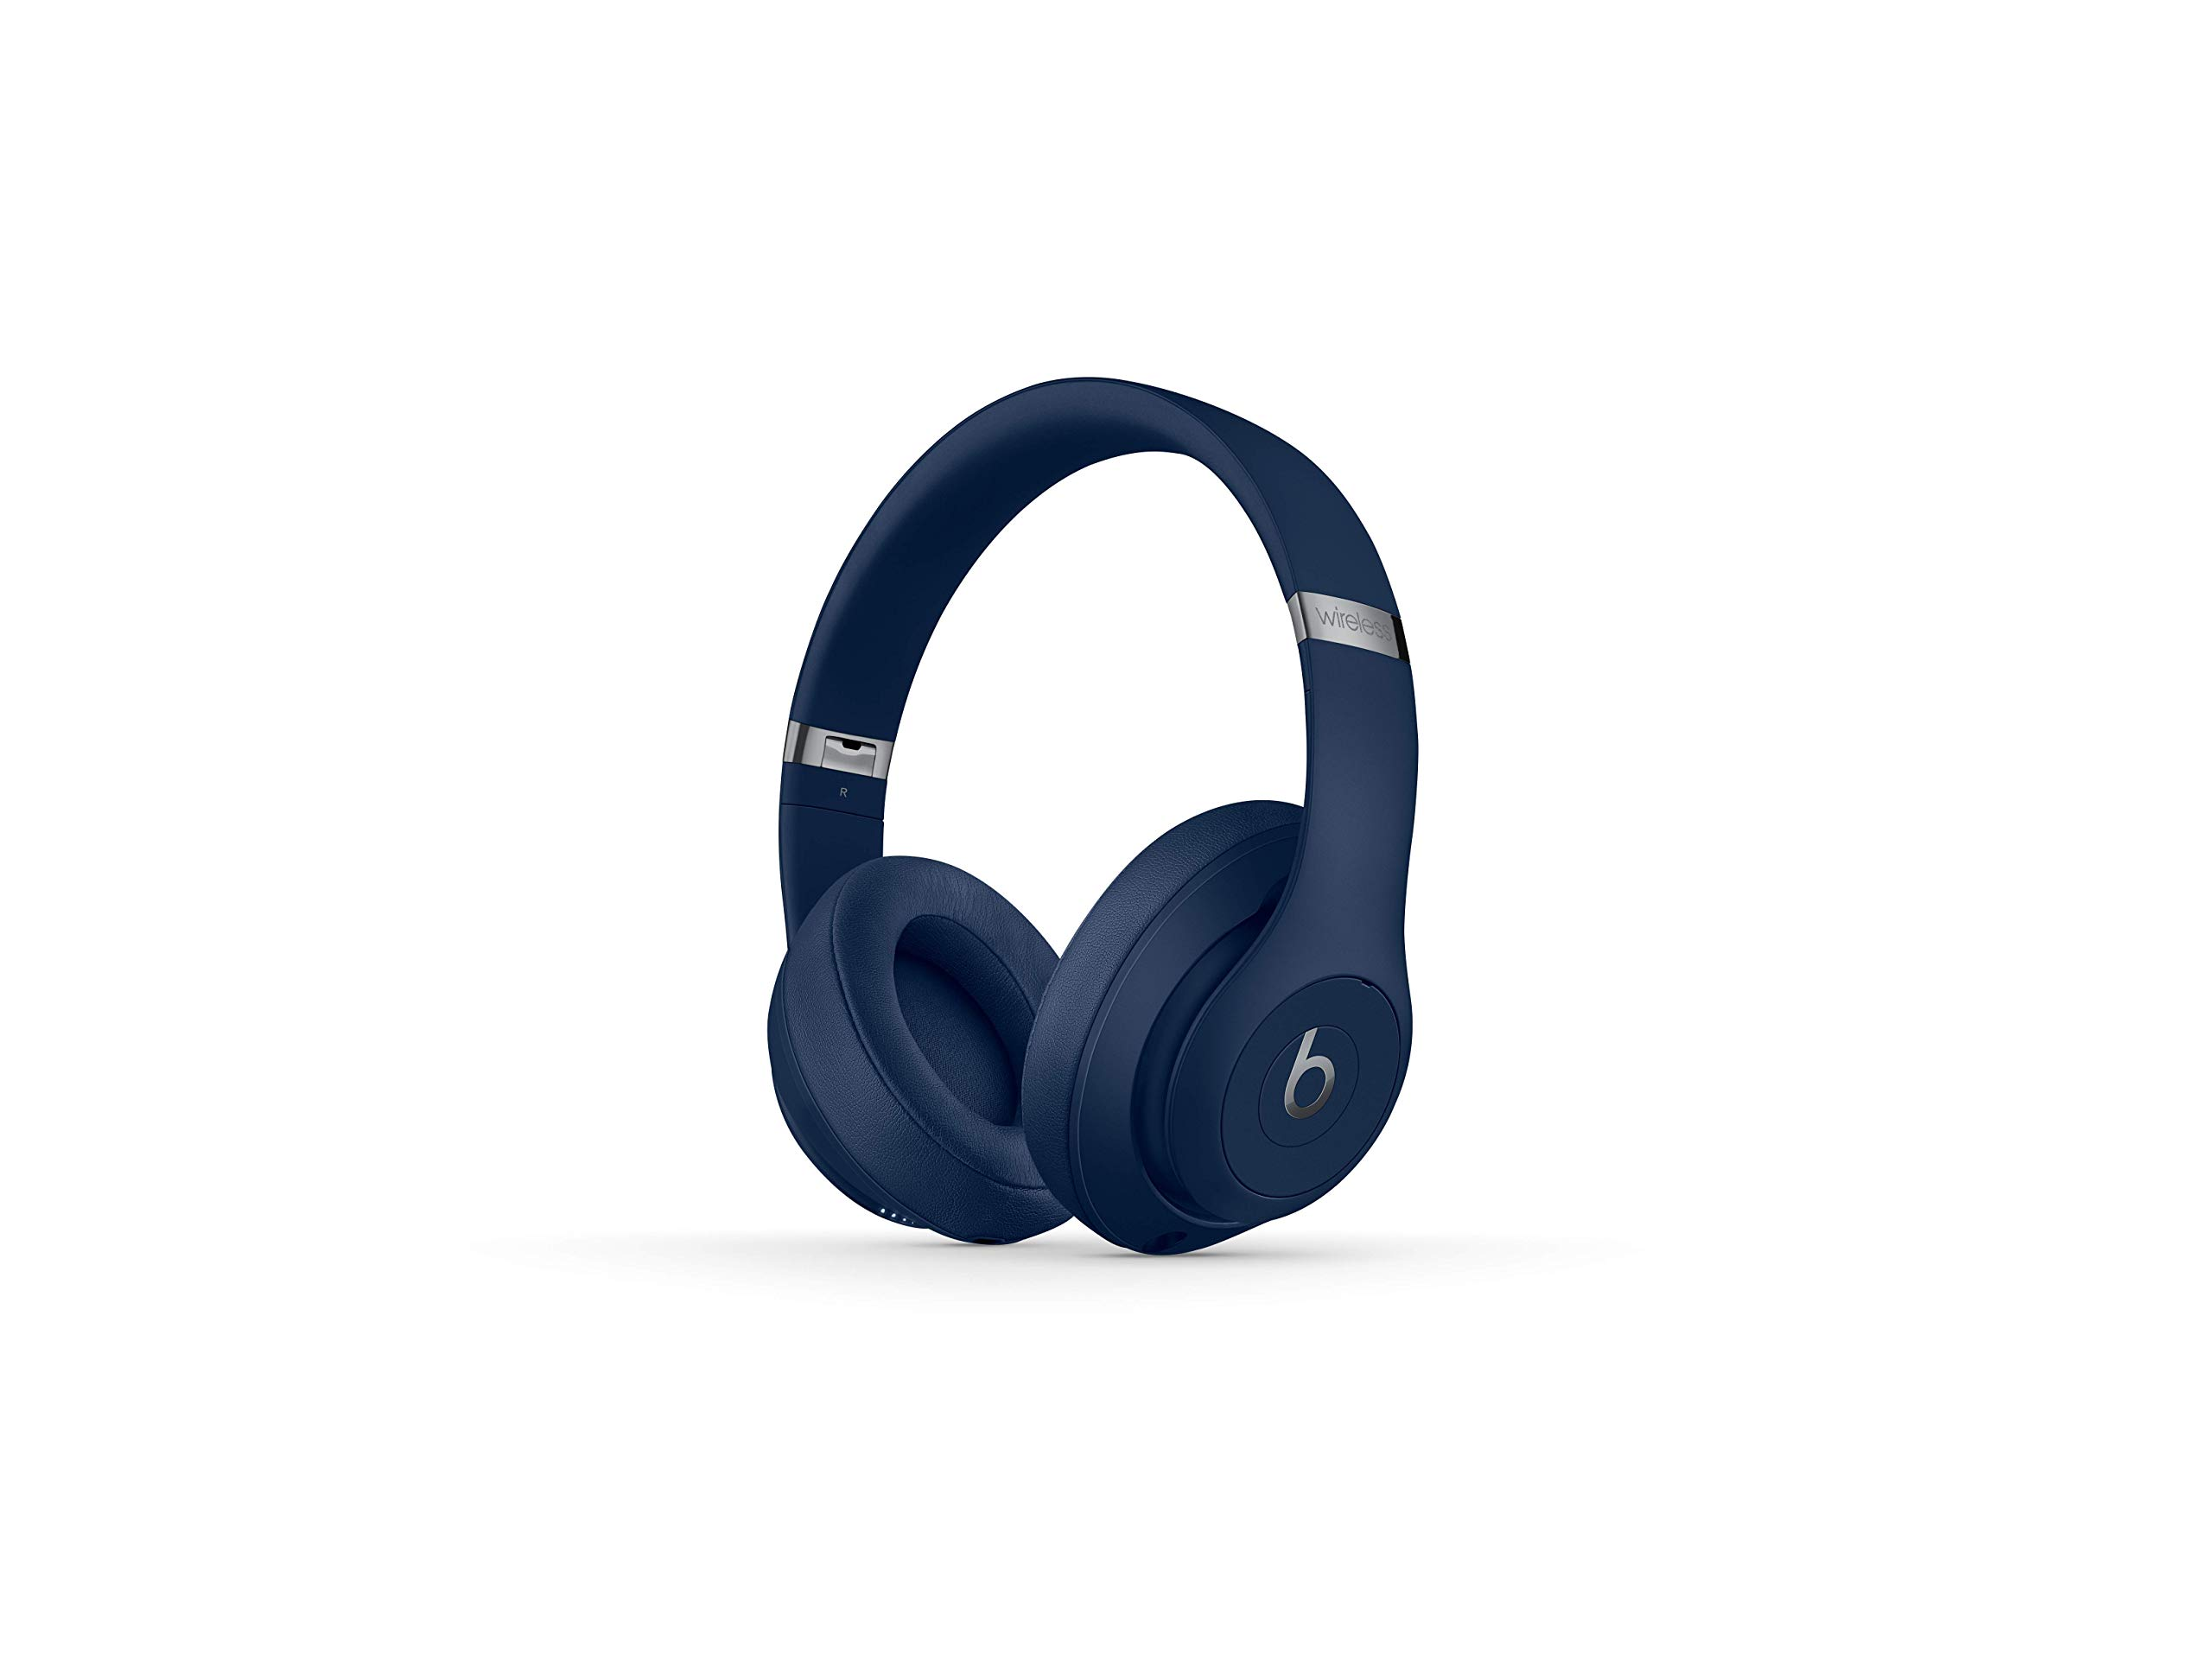 Beats Studio3 Wireless Headphones - 71EyNAQ2AnL - Beats Studio3 Wireless Headphones